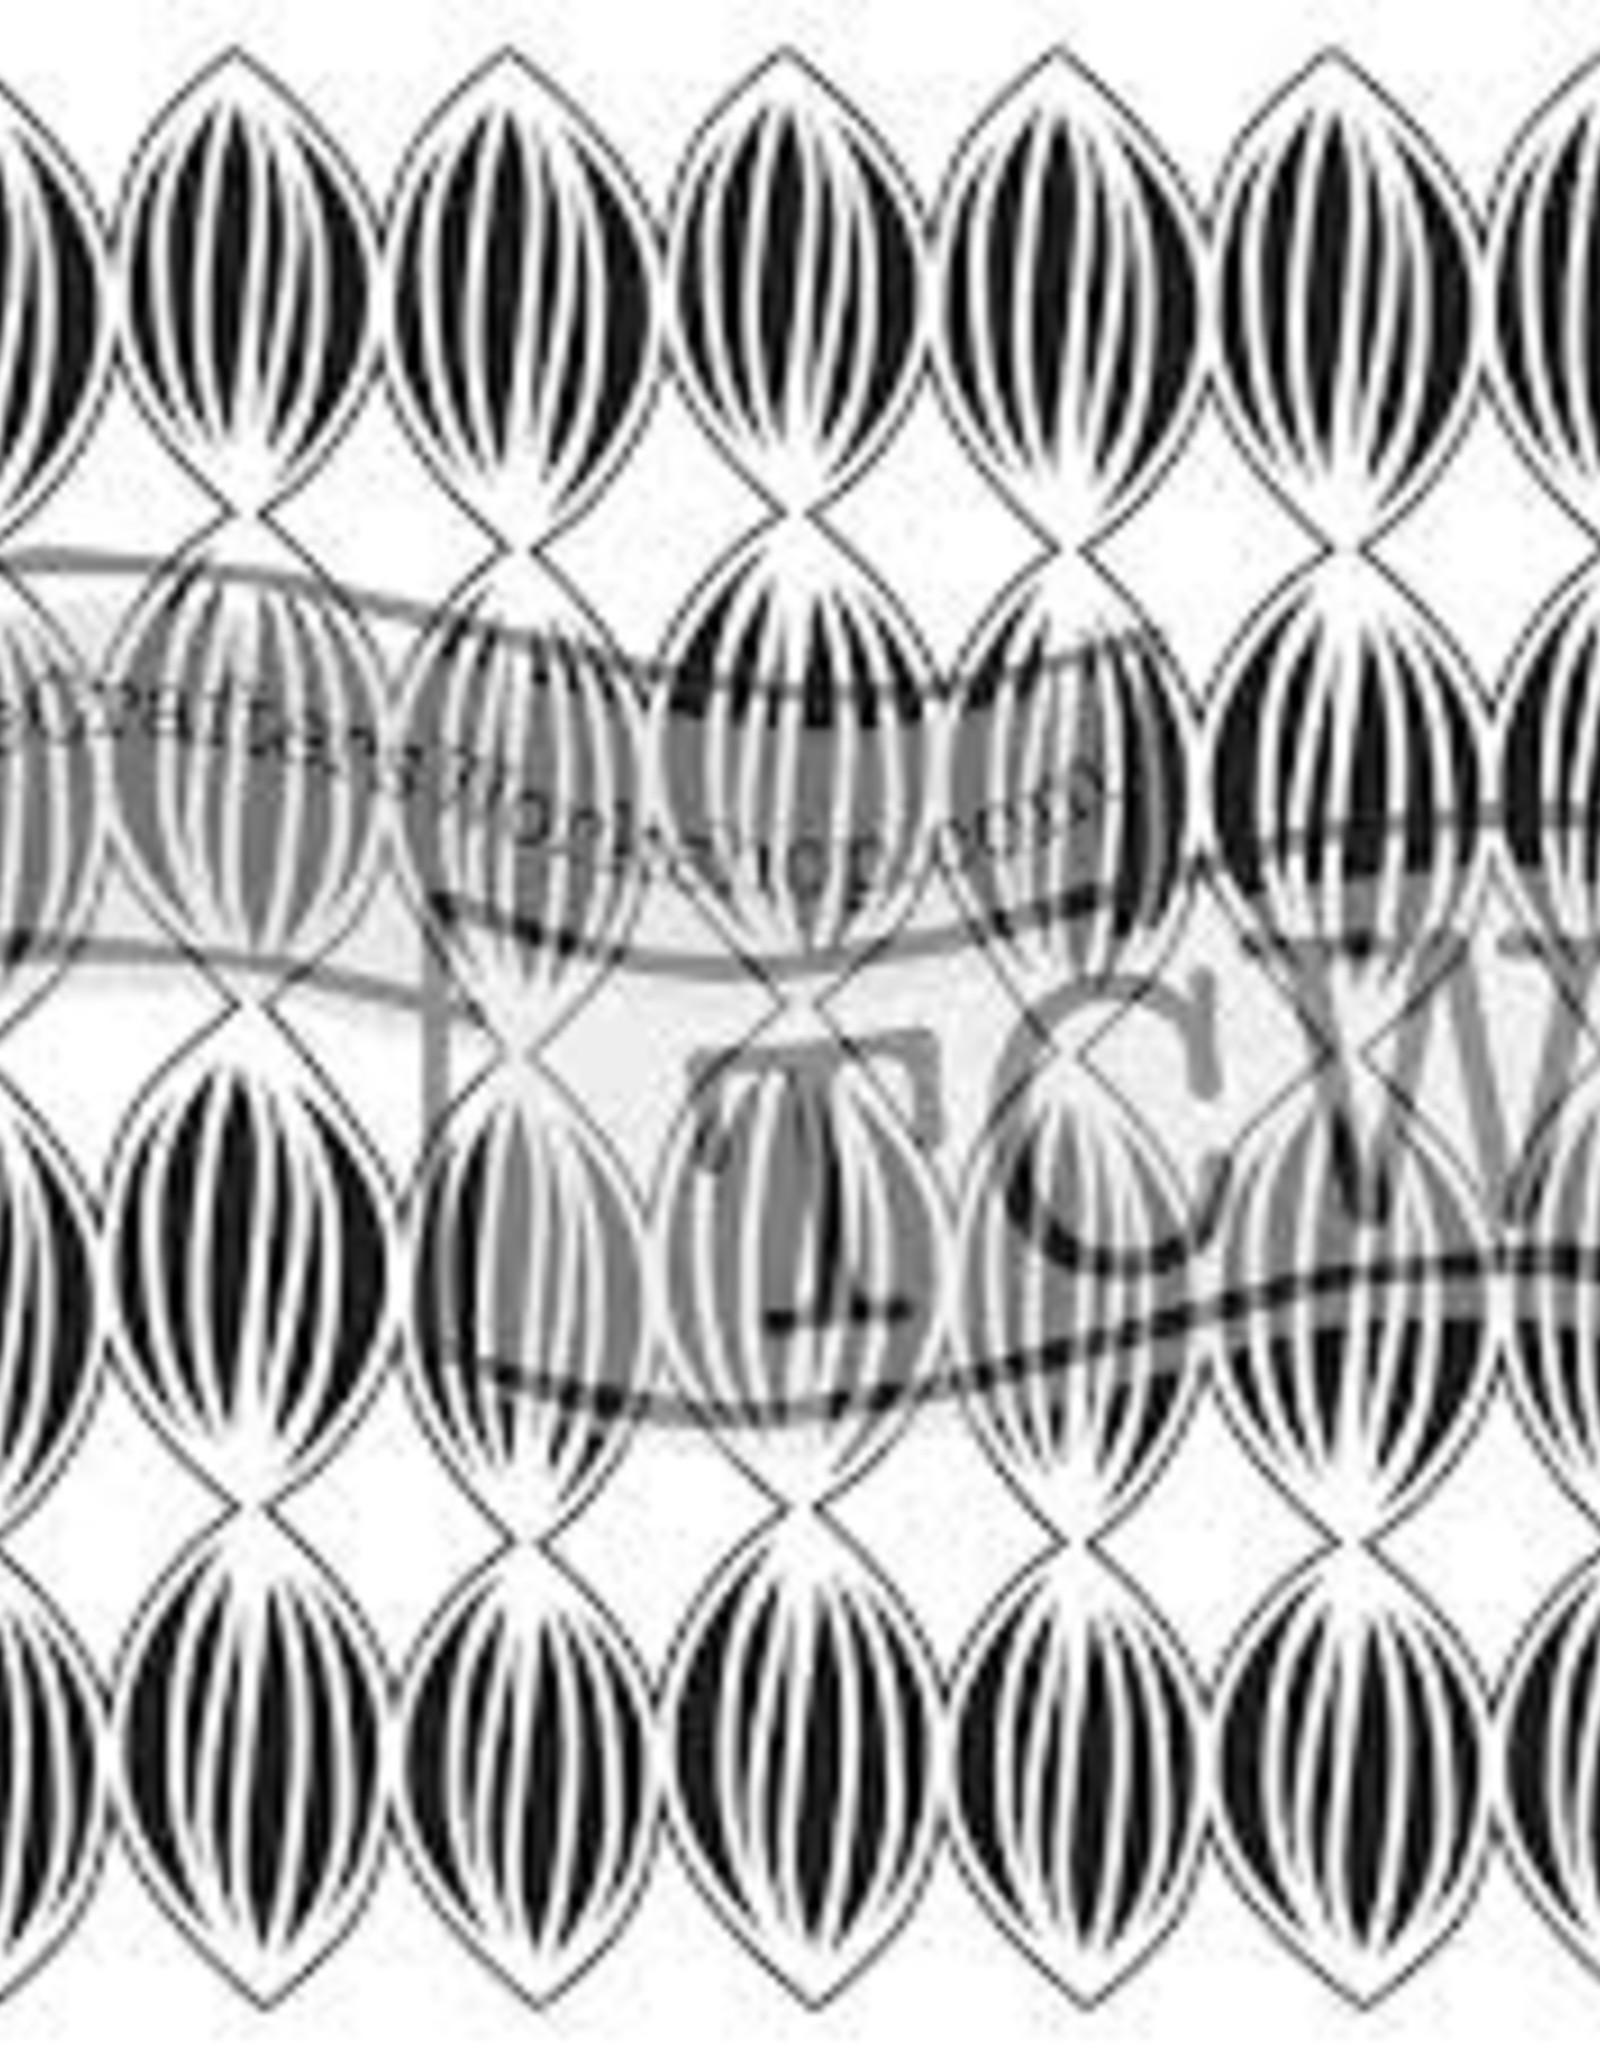 Stencil Onion Skin